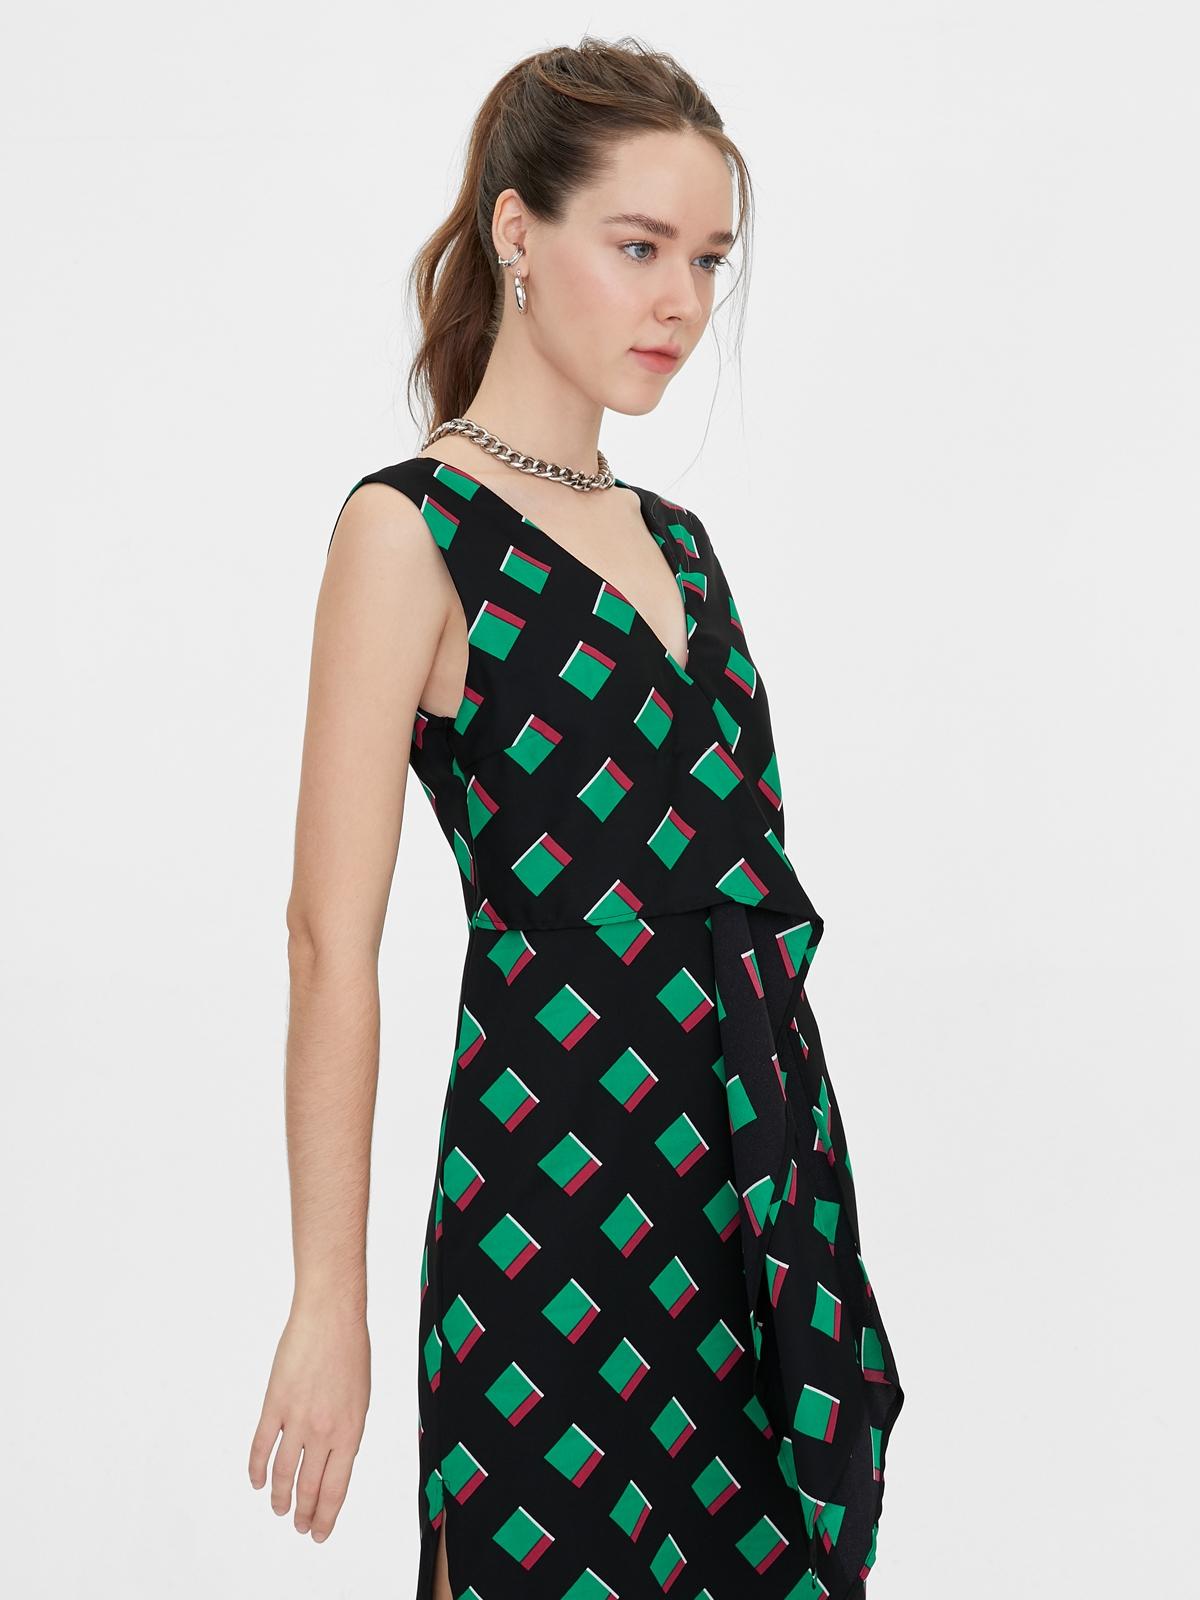 Matter Makers Geometric Printed Dress Black